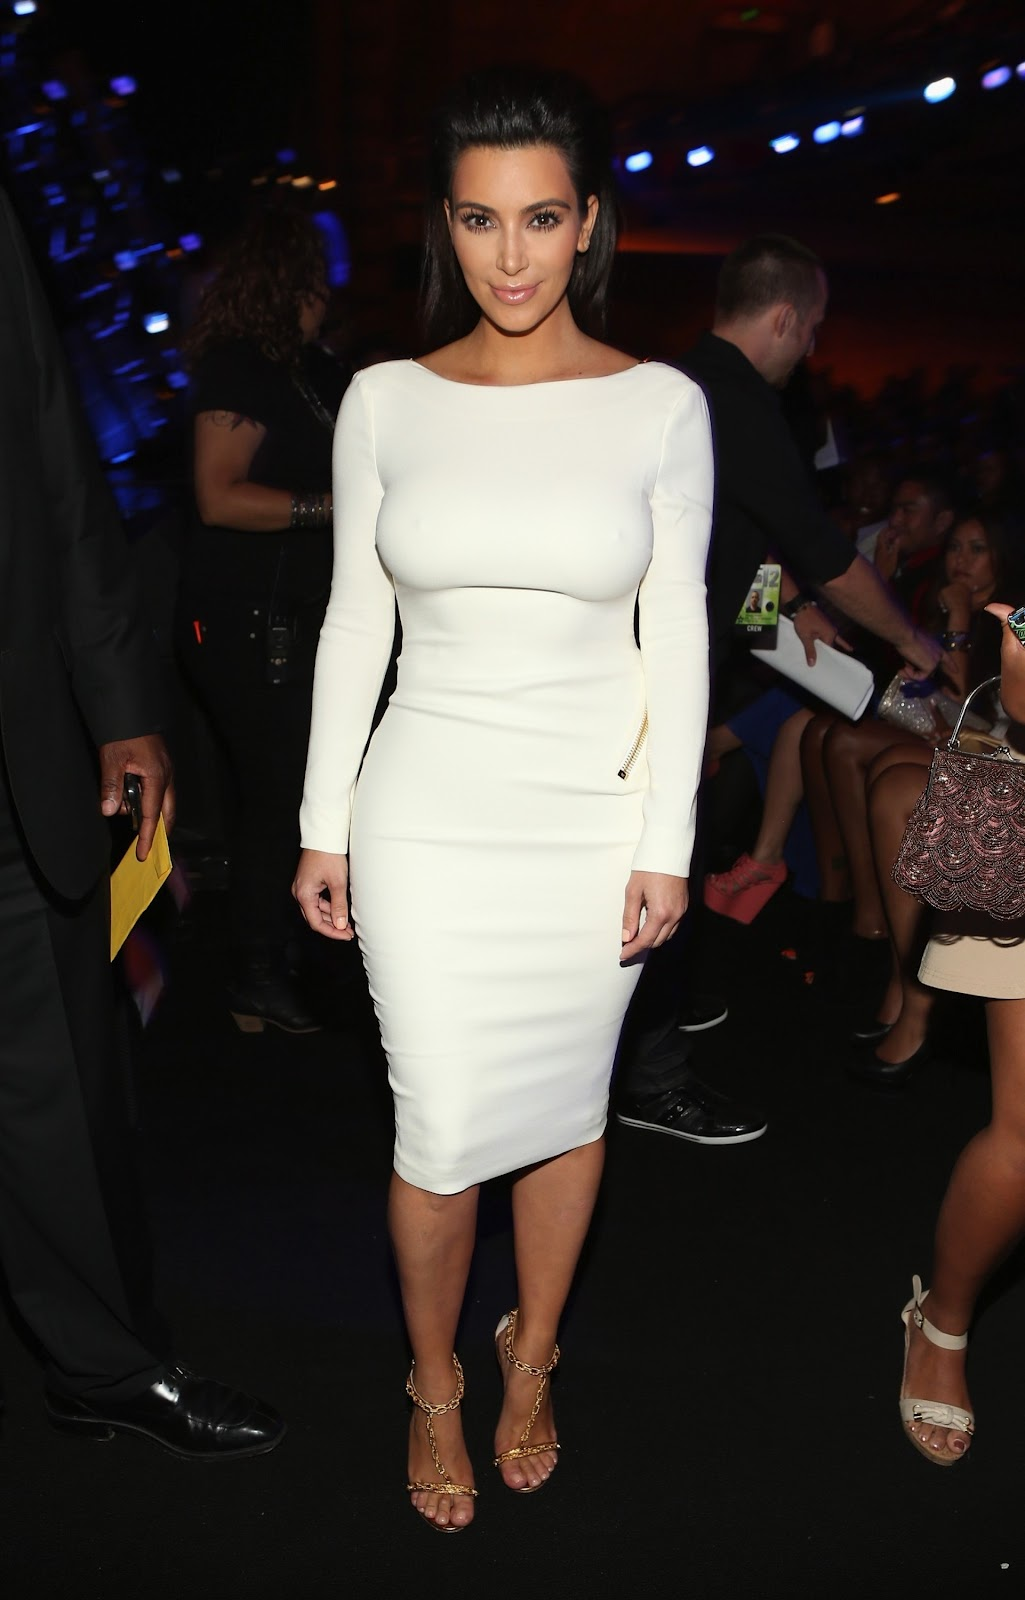 http://2.bp.blogspot.com/-MJj10x9-ET8/T_JBCazvU5I/AAAAAAAAJ40/8muckFvQvYA/s1600/Kim+Kardashian+attends+2012+BET+Awards+in+Los+Angeles+-01.jpg